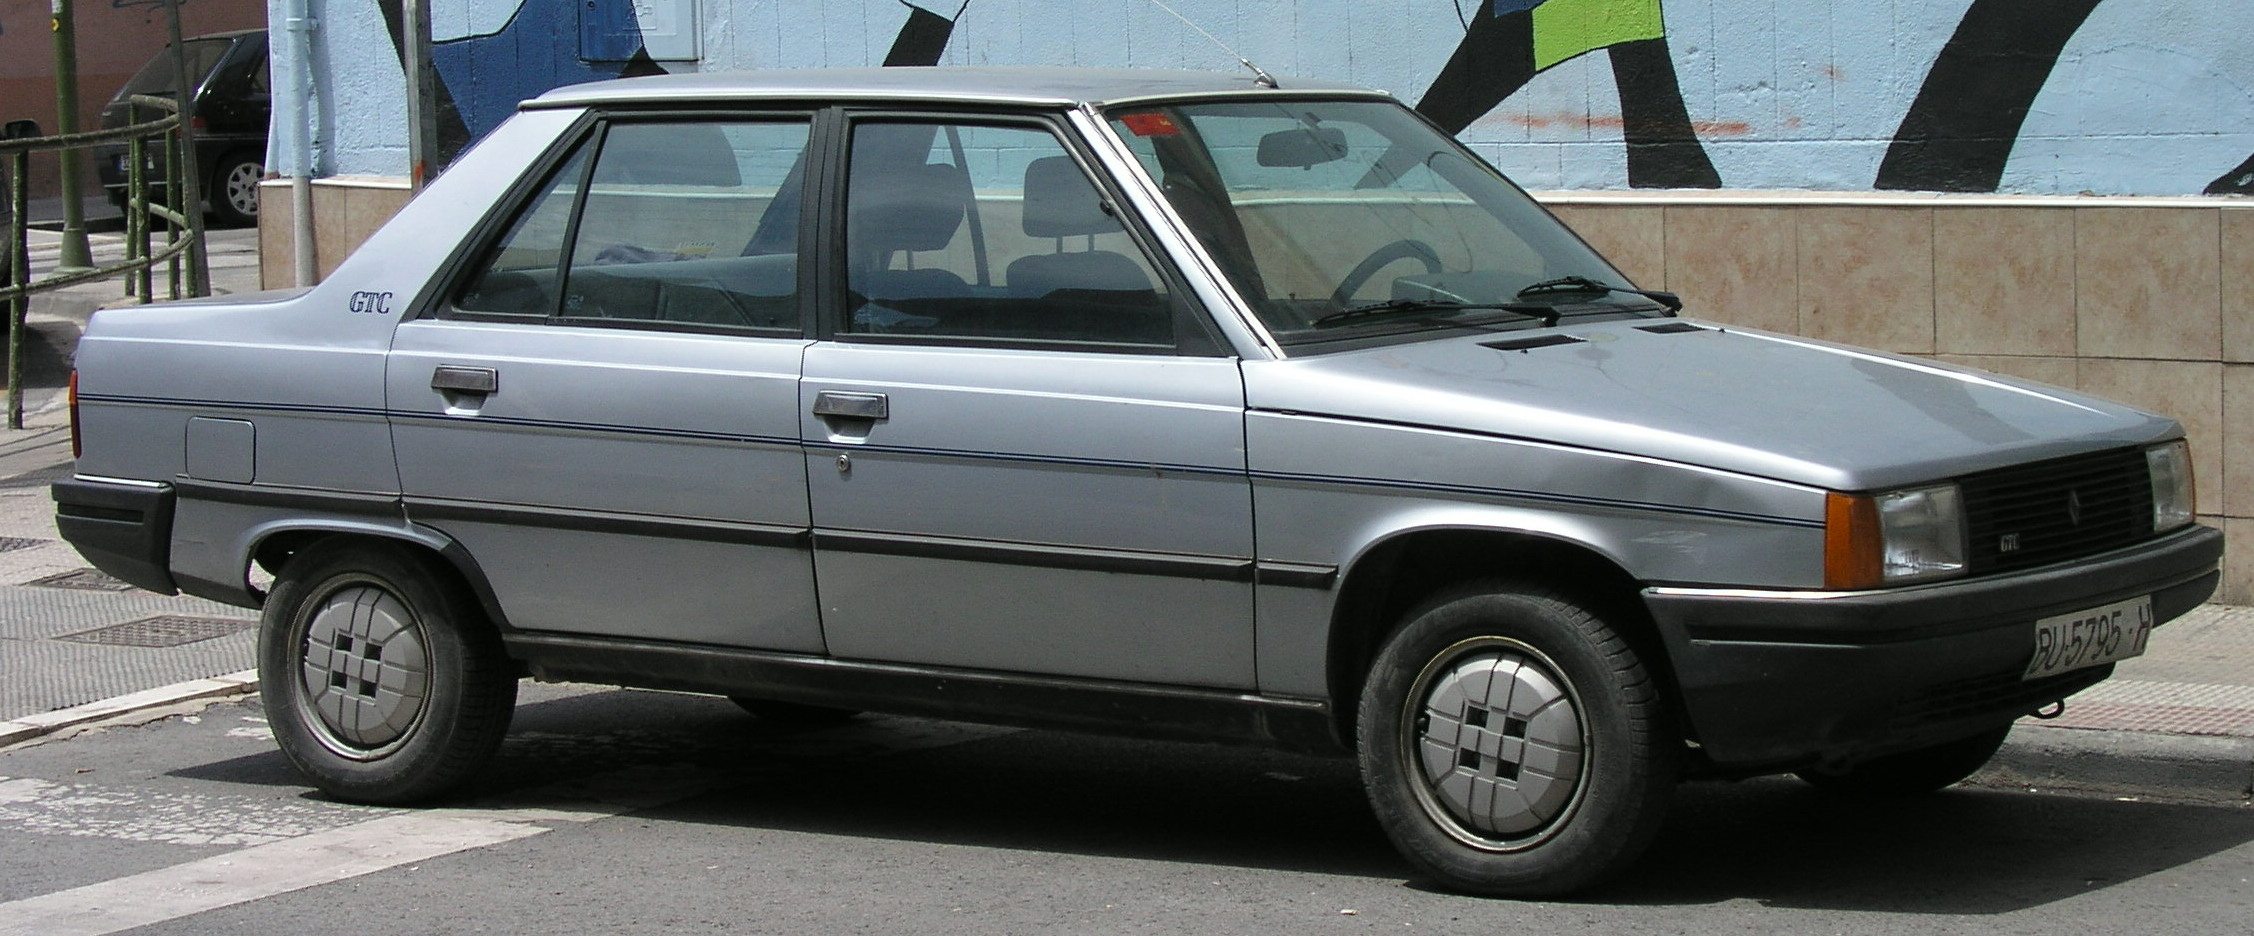 Ford Focus Wikipedia Renault 9 el post qe se merece (imagenes) - Taringa!